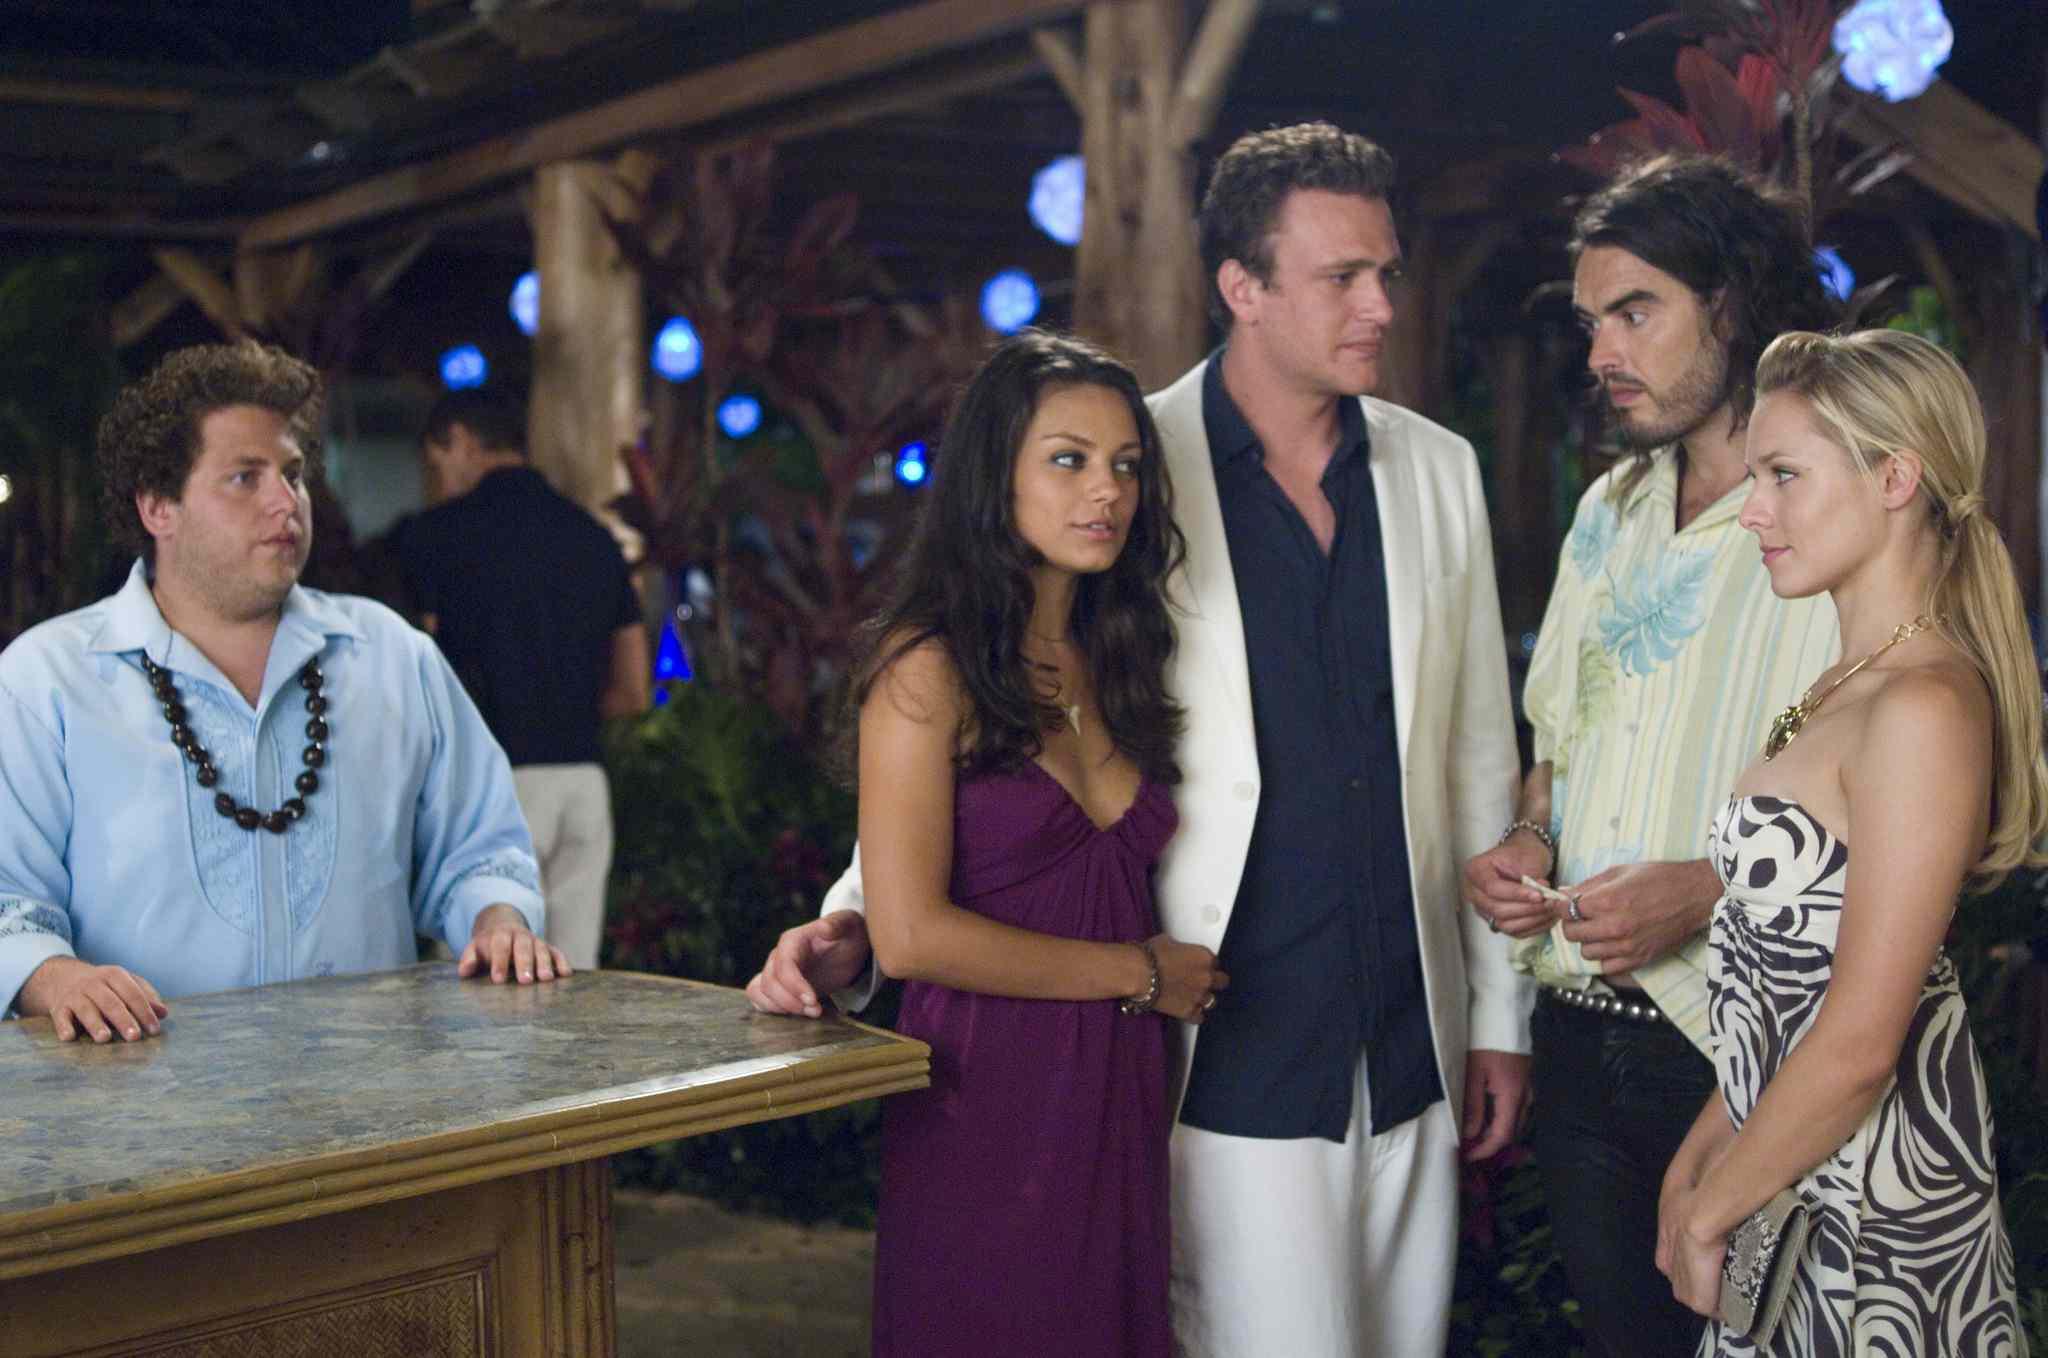 Jonah Hill, Mila Kunis, Jason Segel, Russell Brand, and Kristen Bell in a scene from